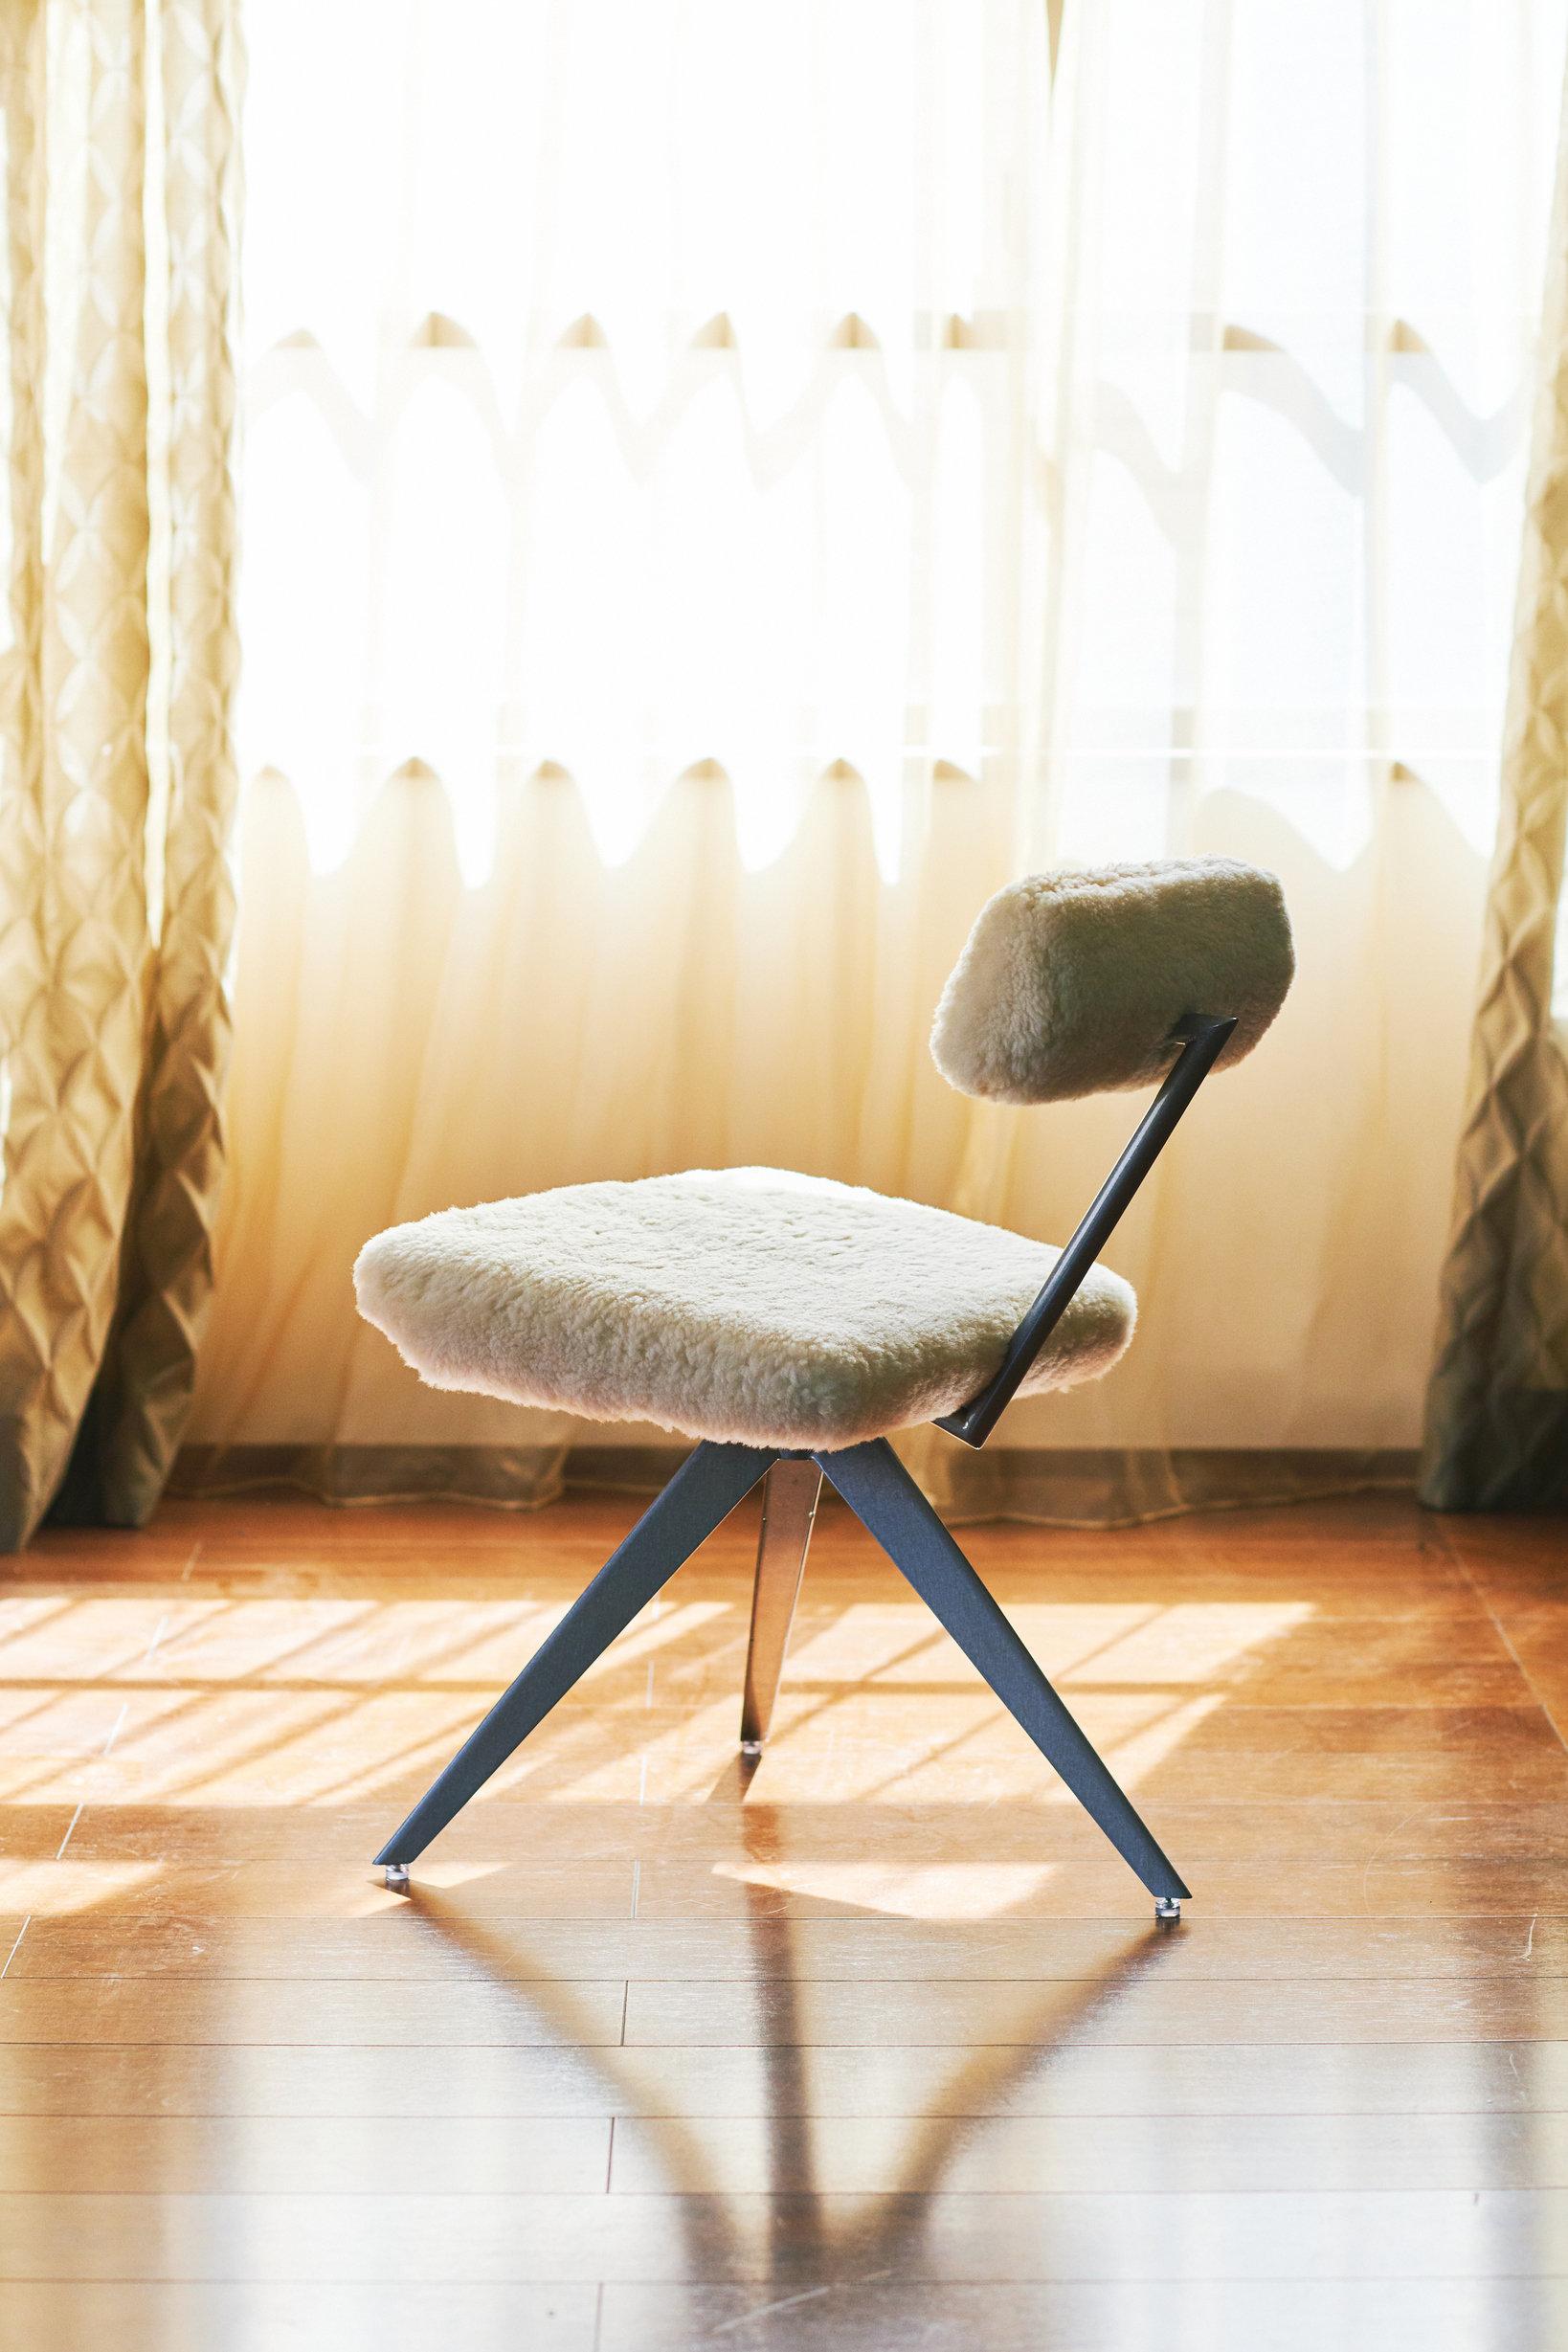 Fluffy Chair デザイン:ザハ・ハディド・アーキテクツ 製作/五反田製作所グループ サイズ:W480×D530×H700(SH445)mm 発表年/1990年